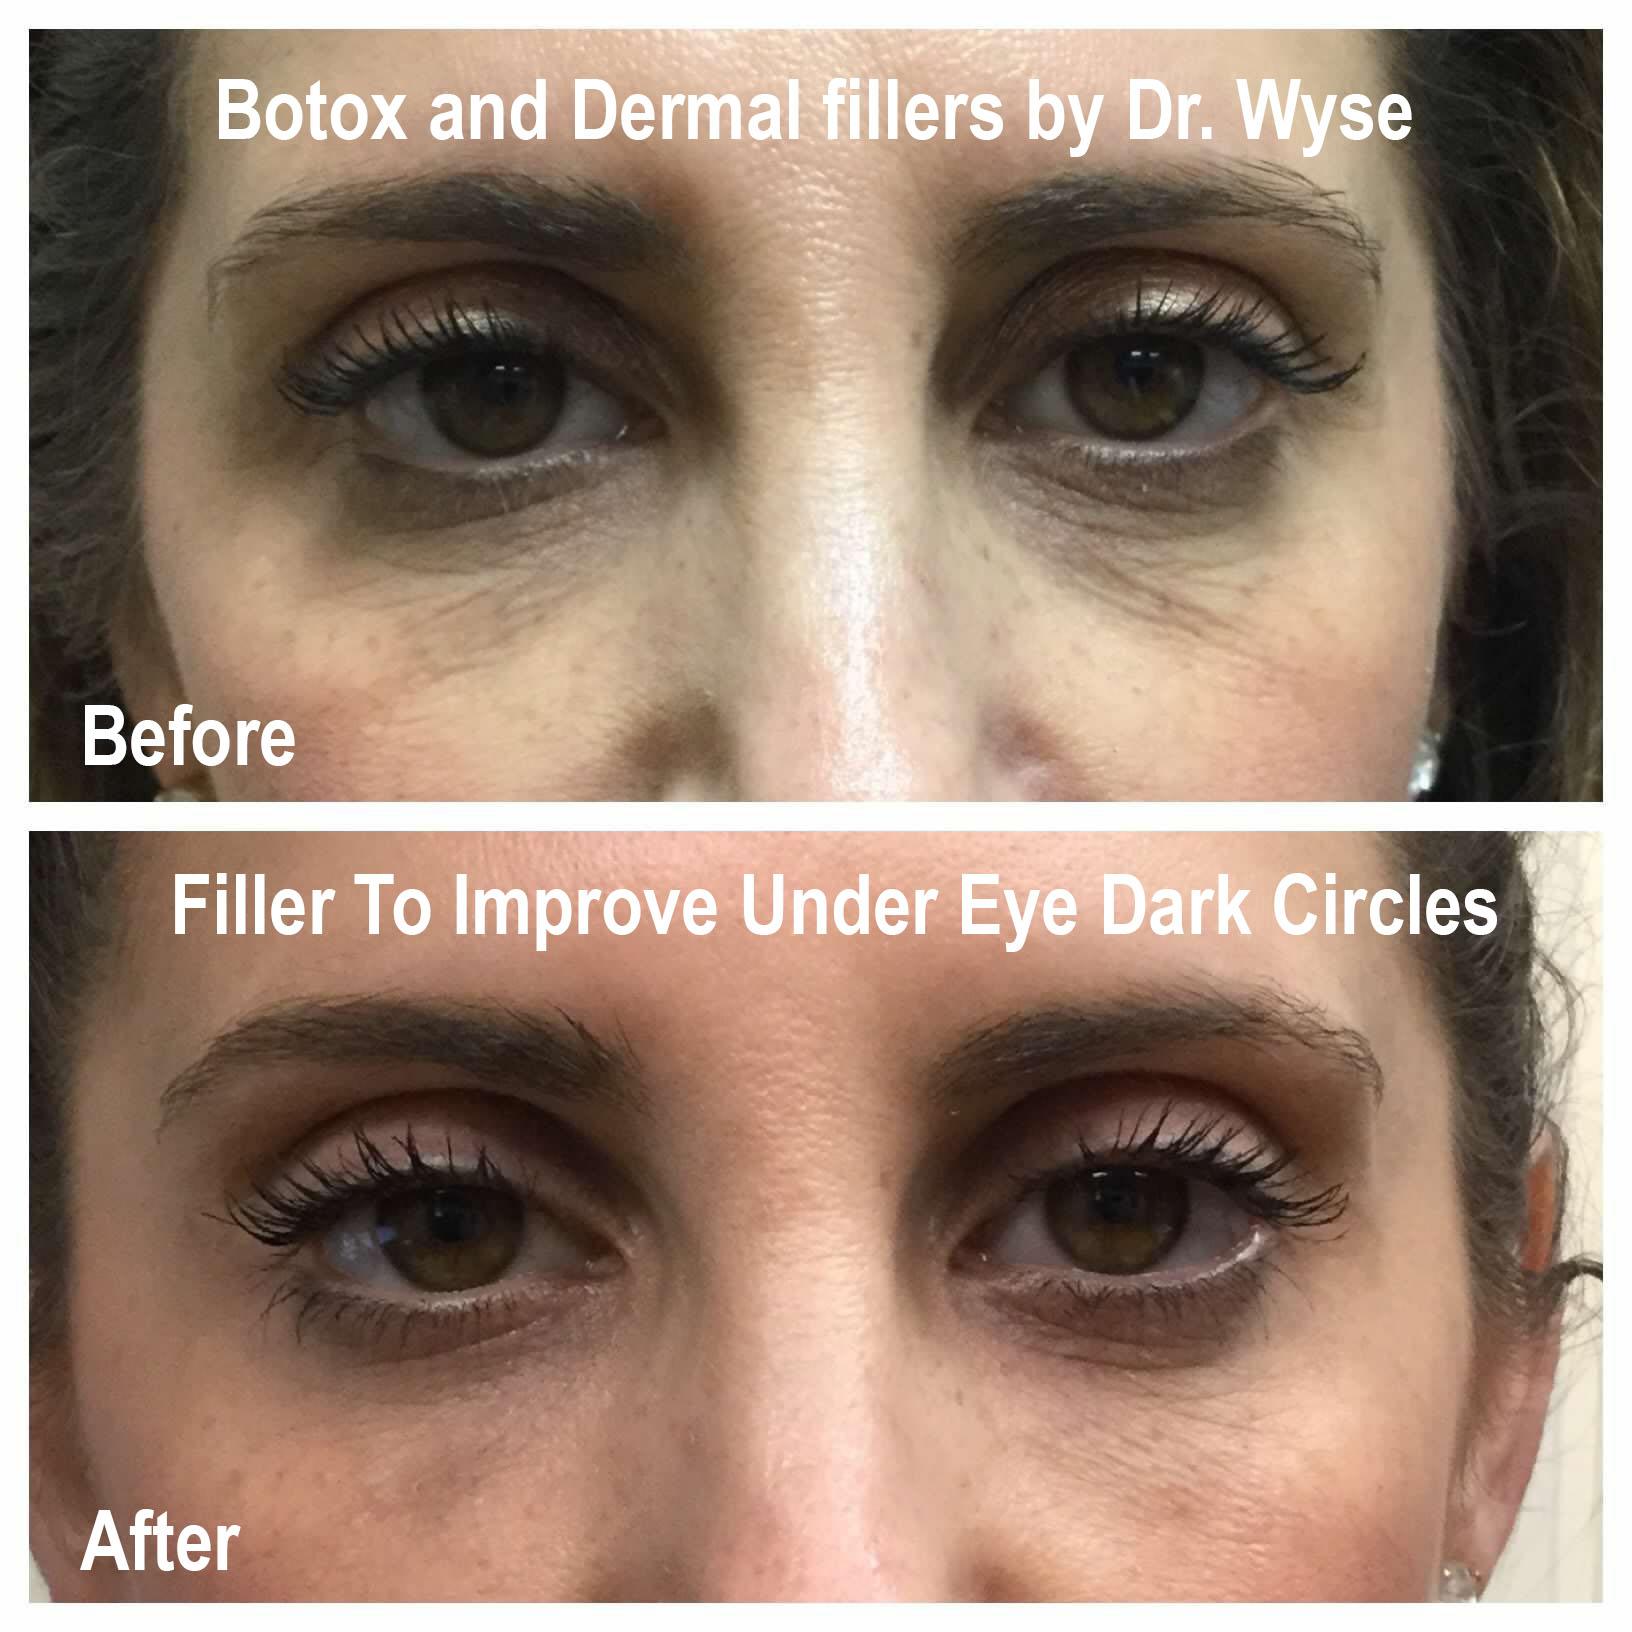 Fillers to Improve Under Eye Dark Circles